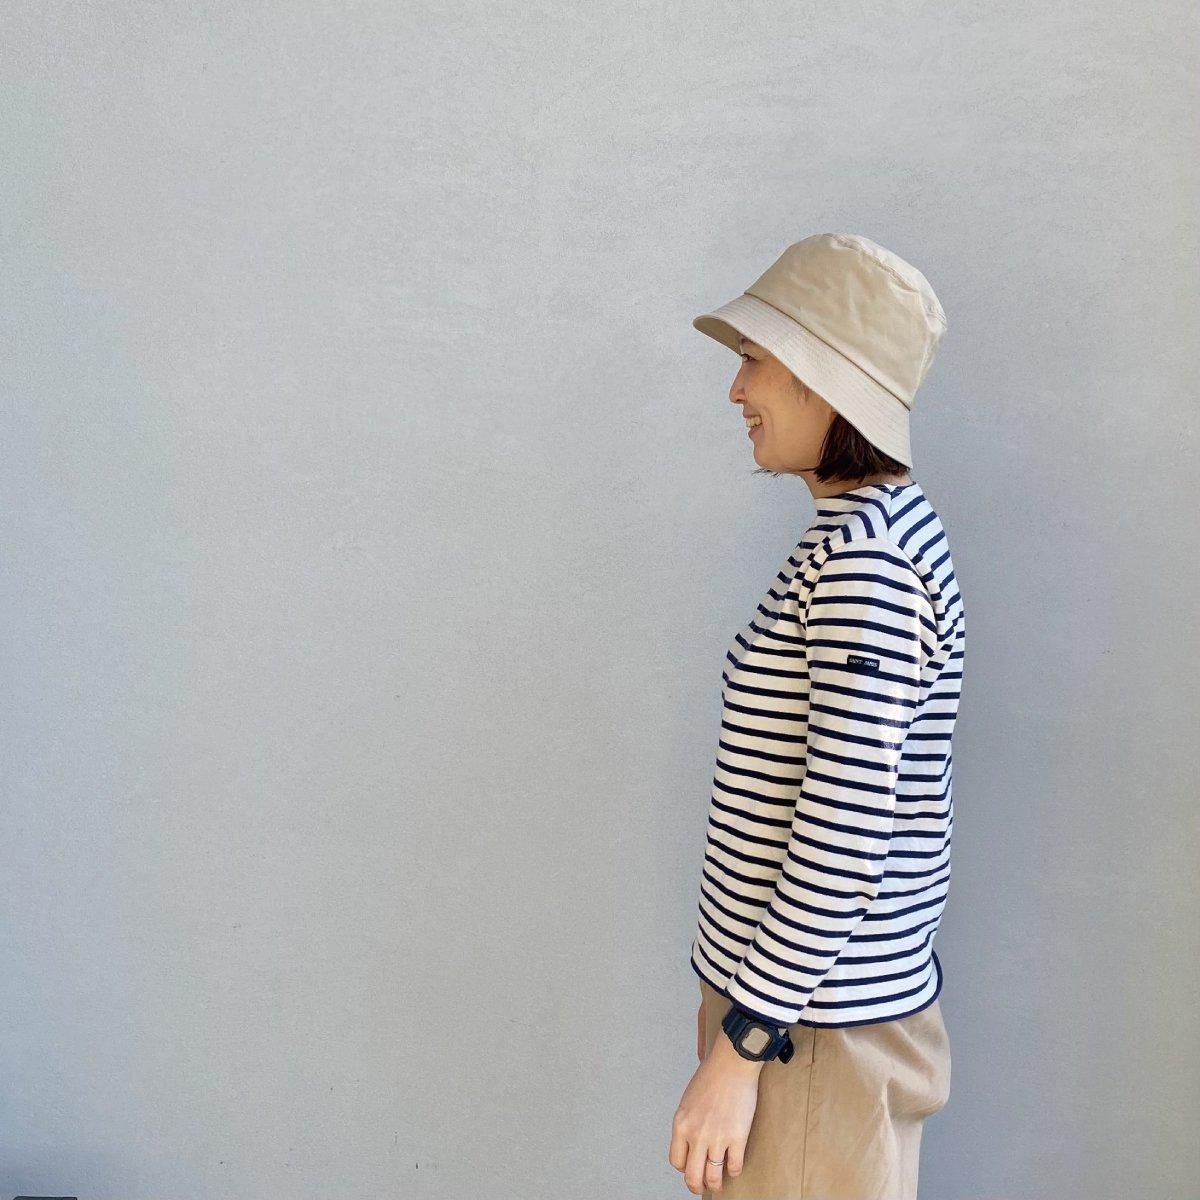 Genius BK Hat 詳細画像25